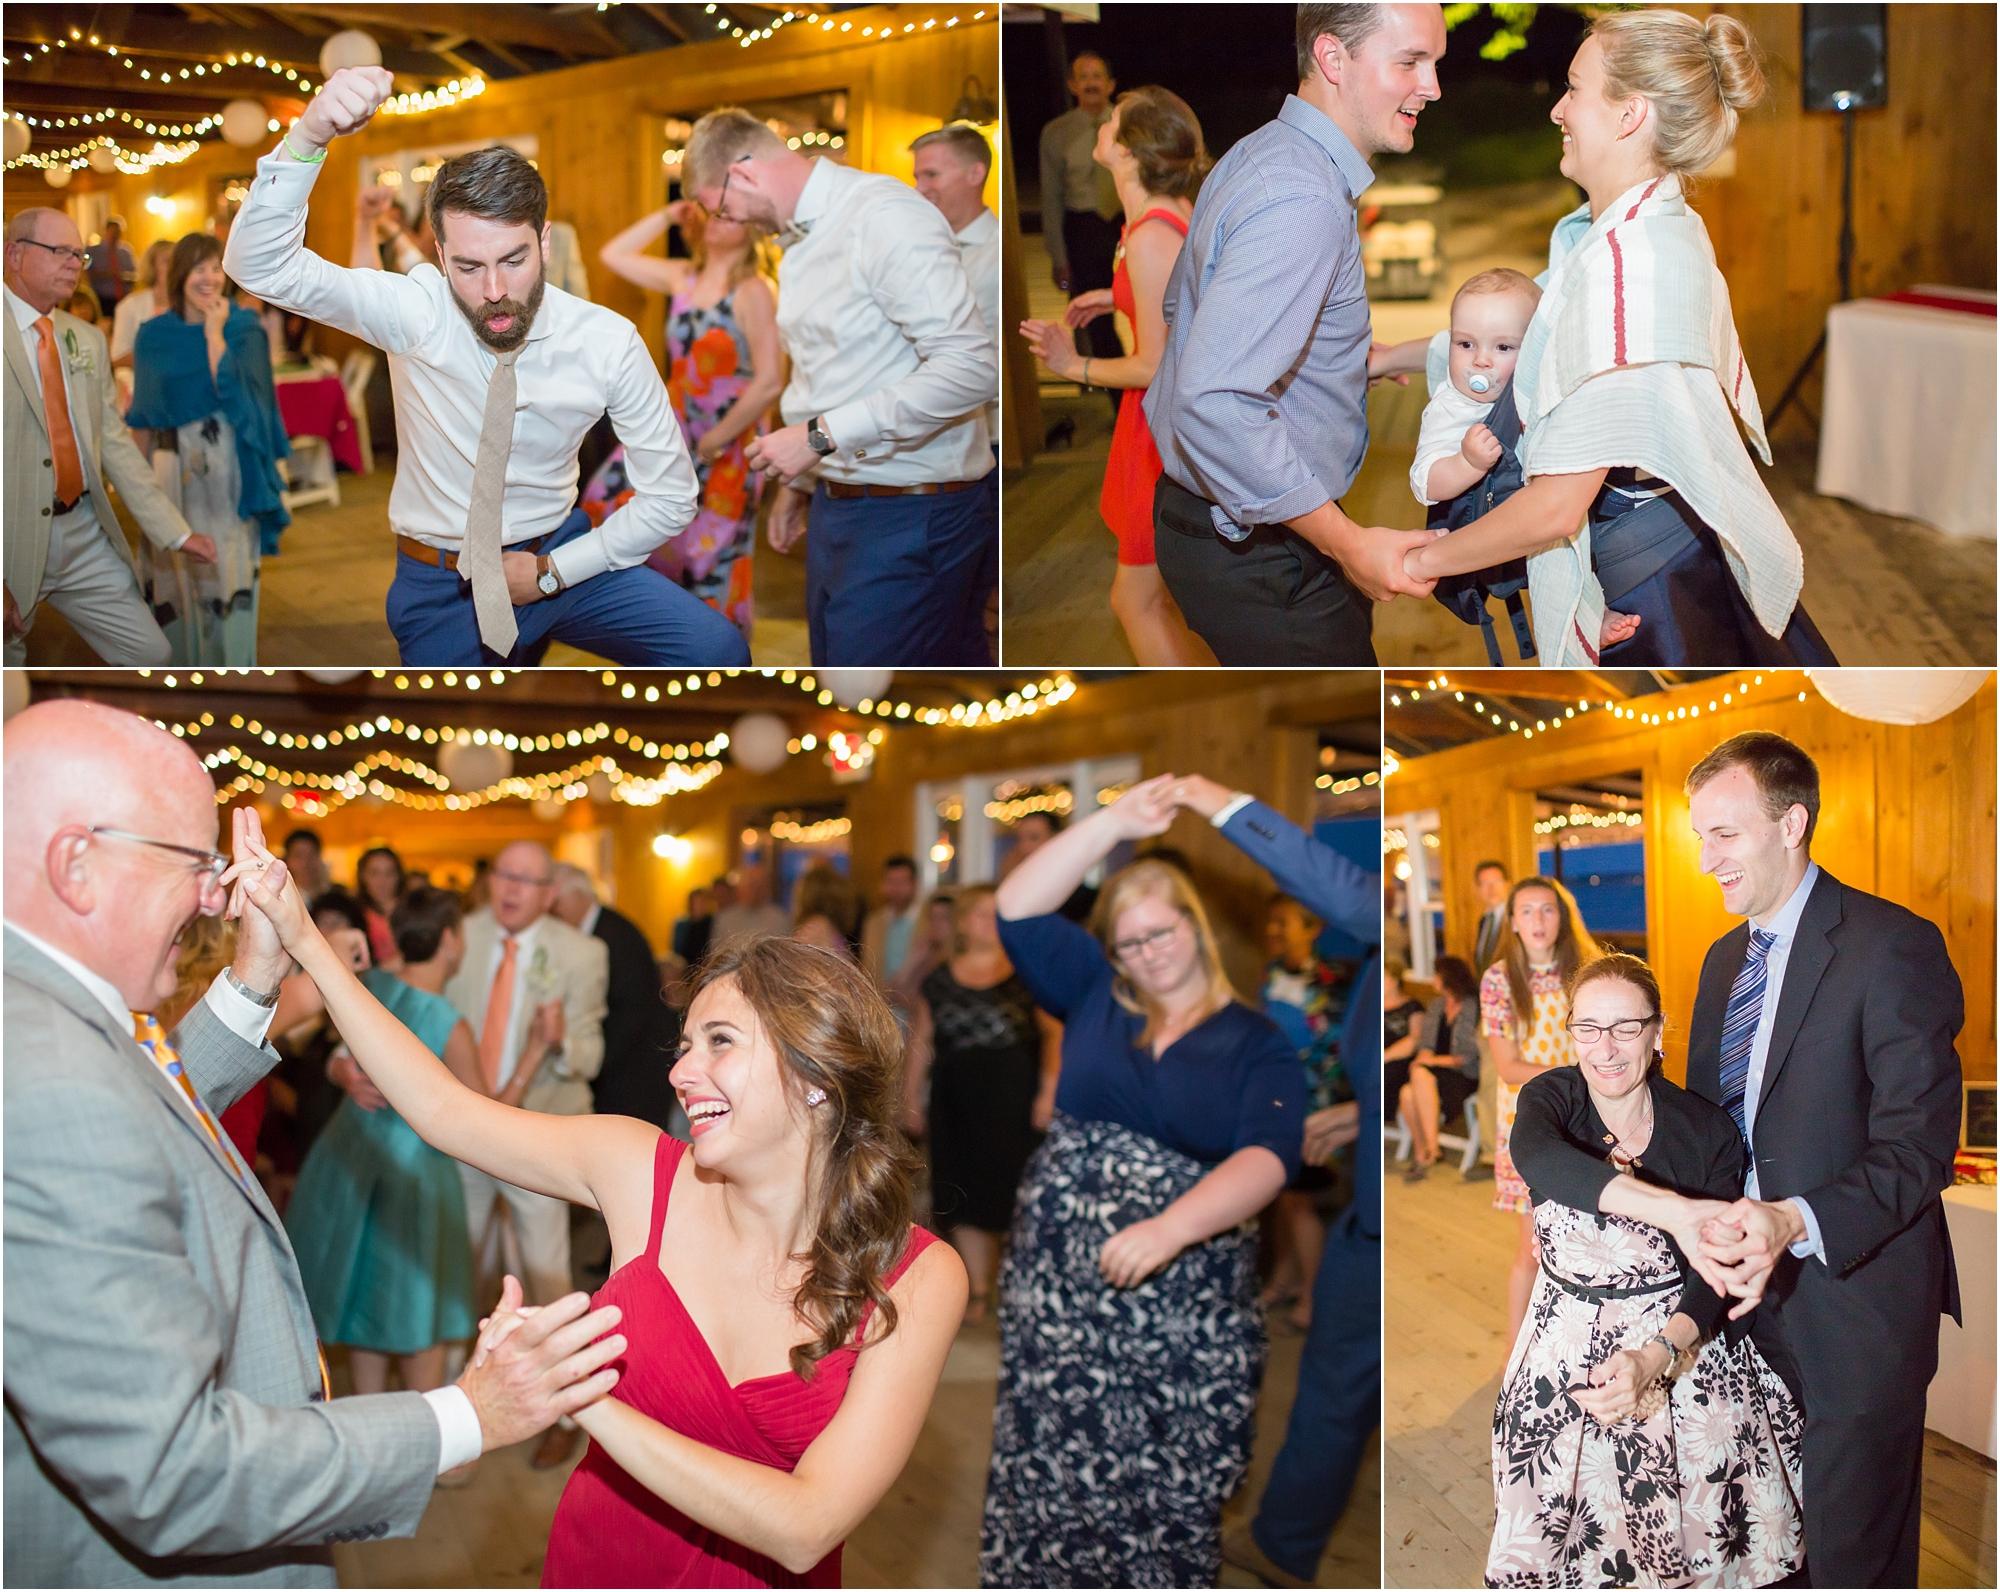 I love that baby on the dance floor!